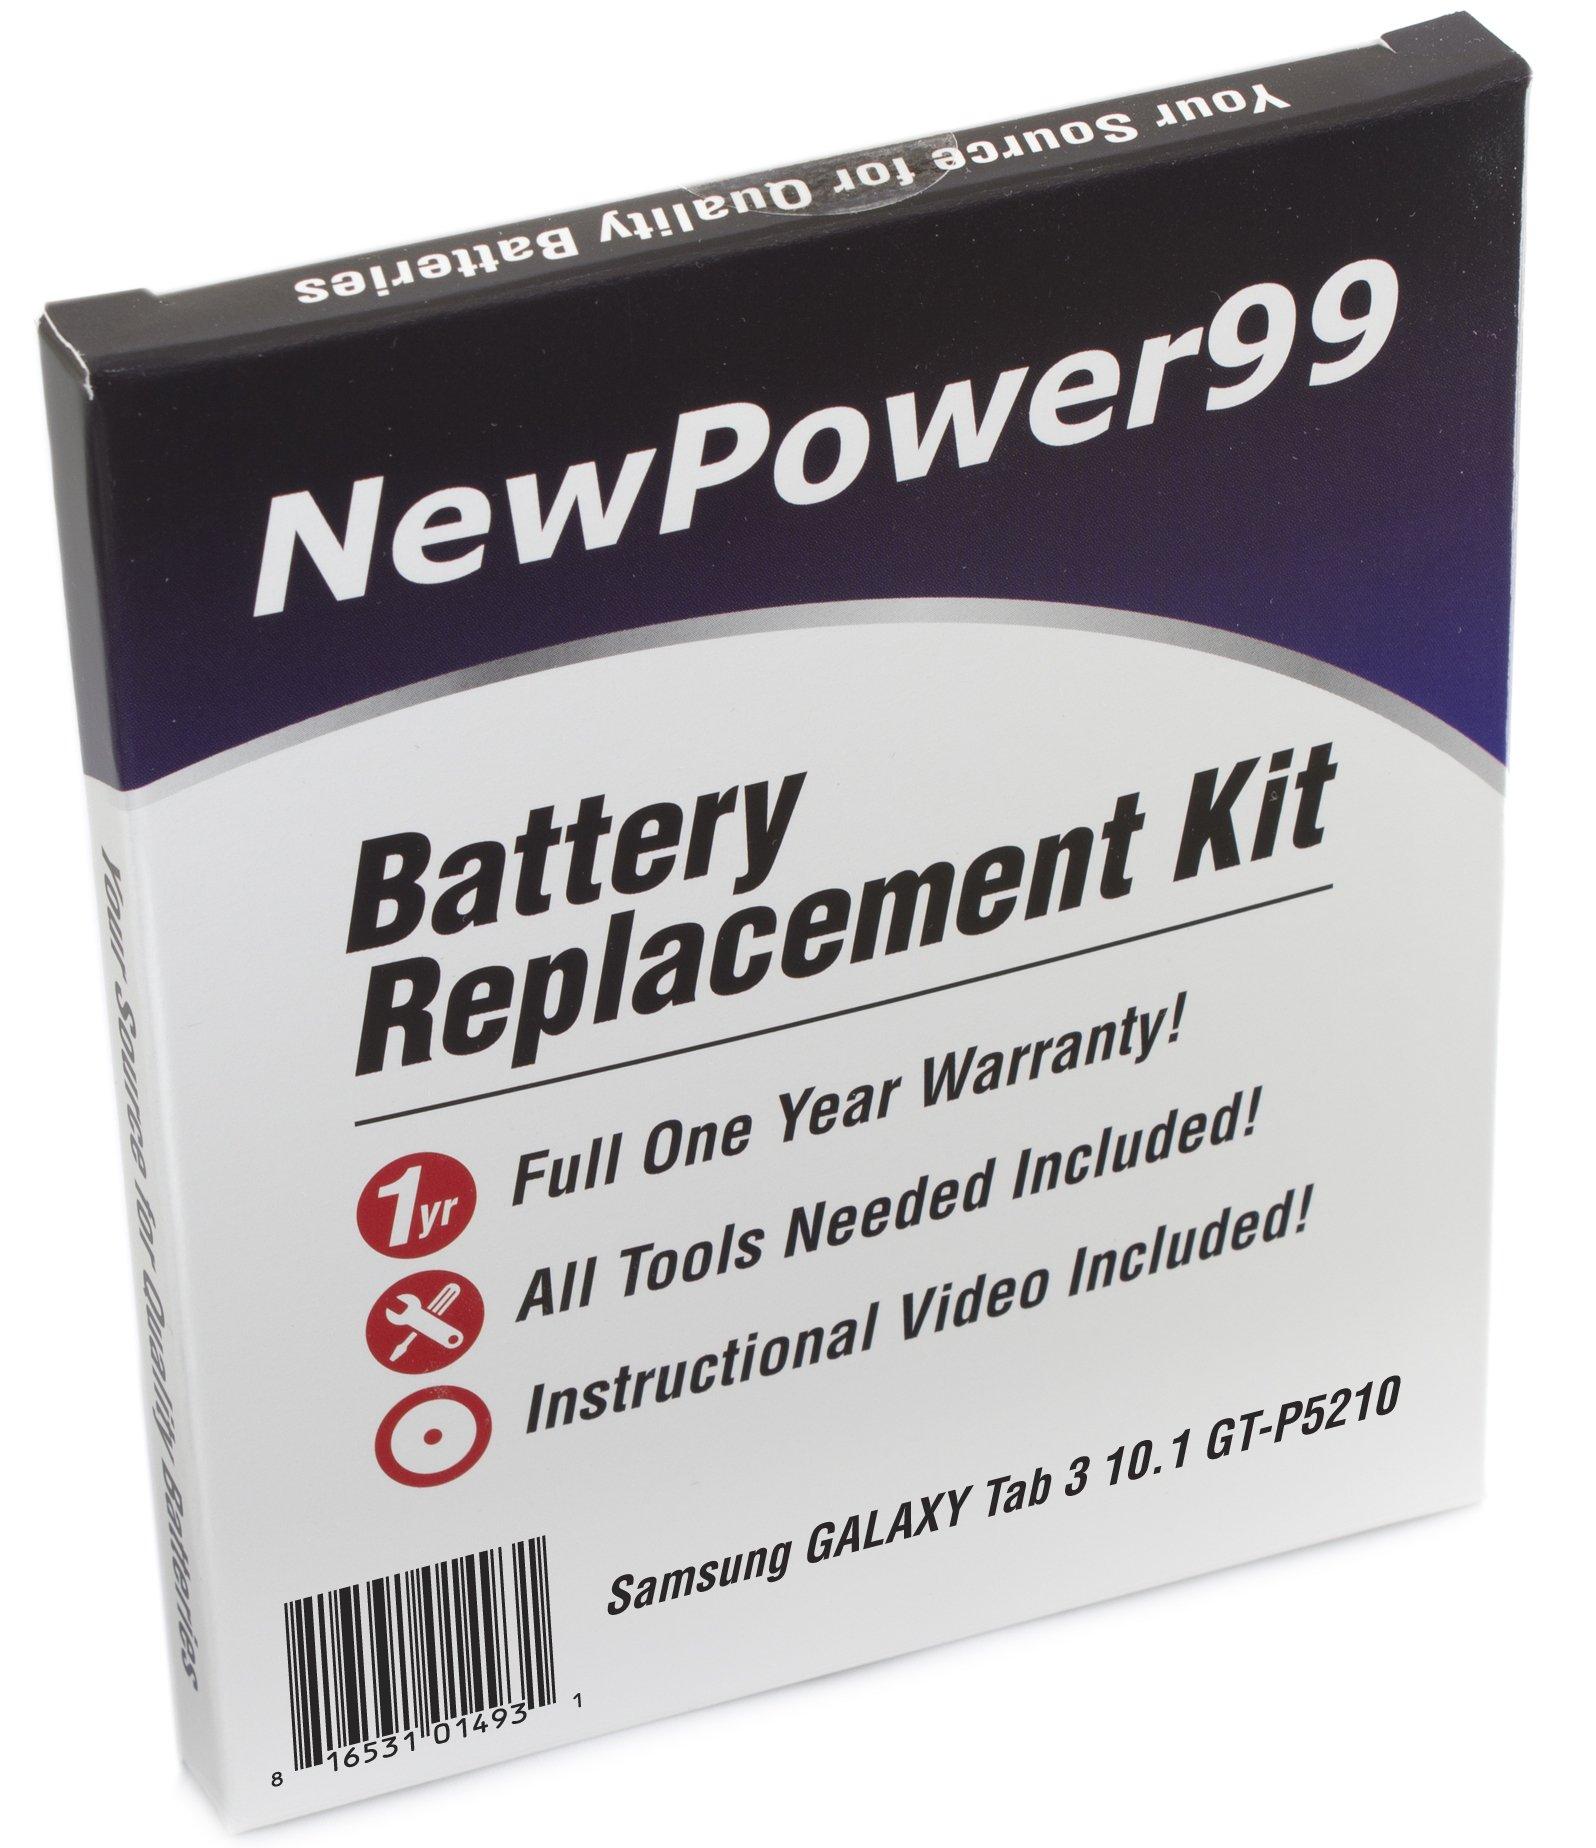 Bateria Tablet para Samsung Tab 3 10.1 GT-P5210 Kit con Vide